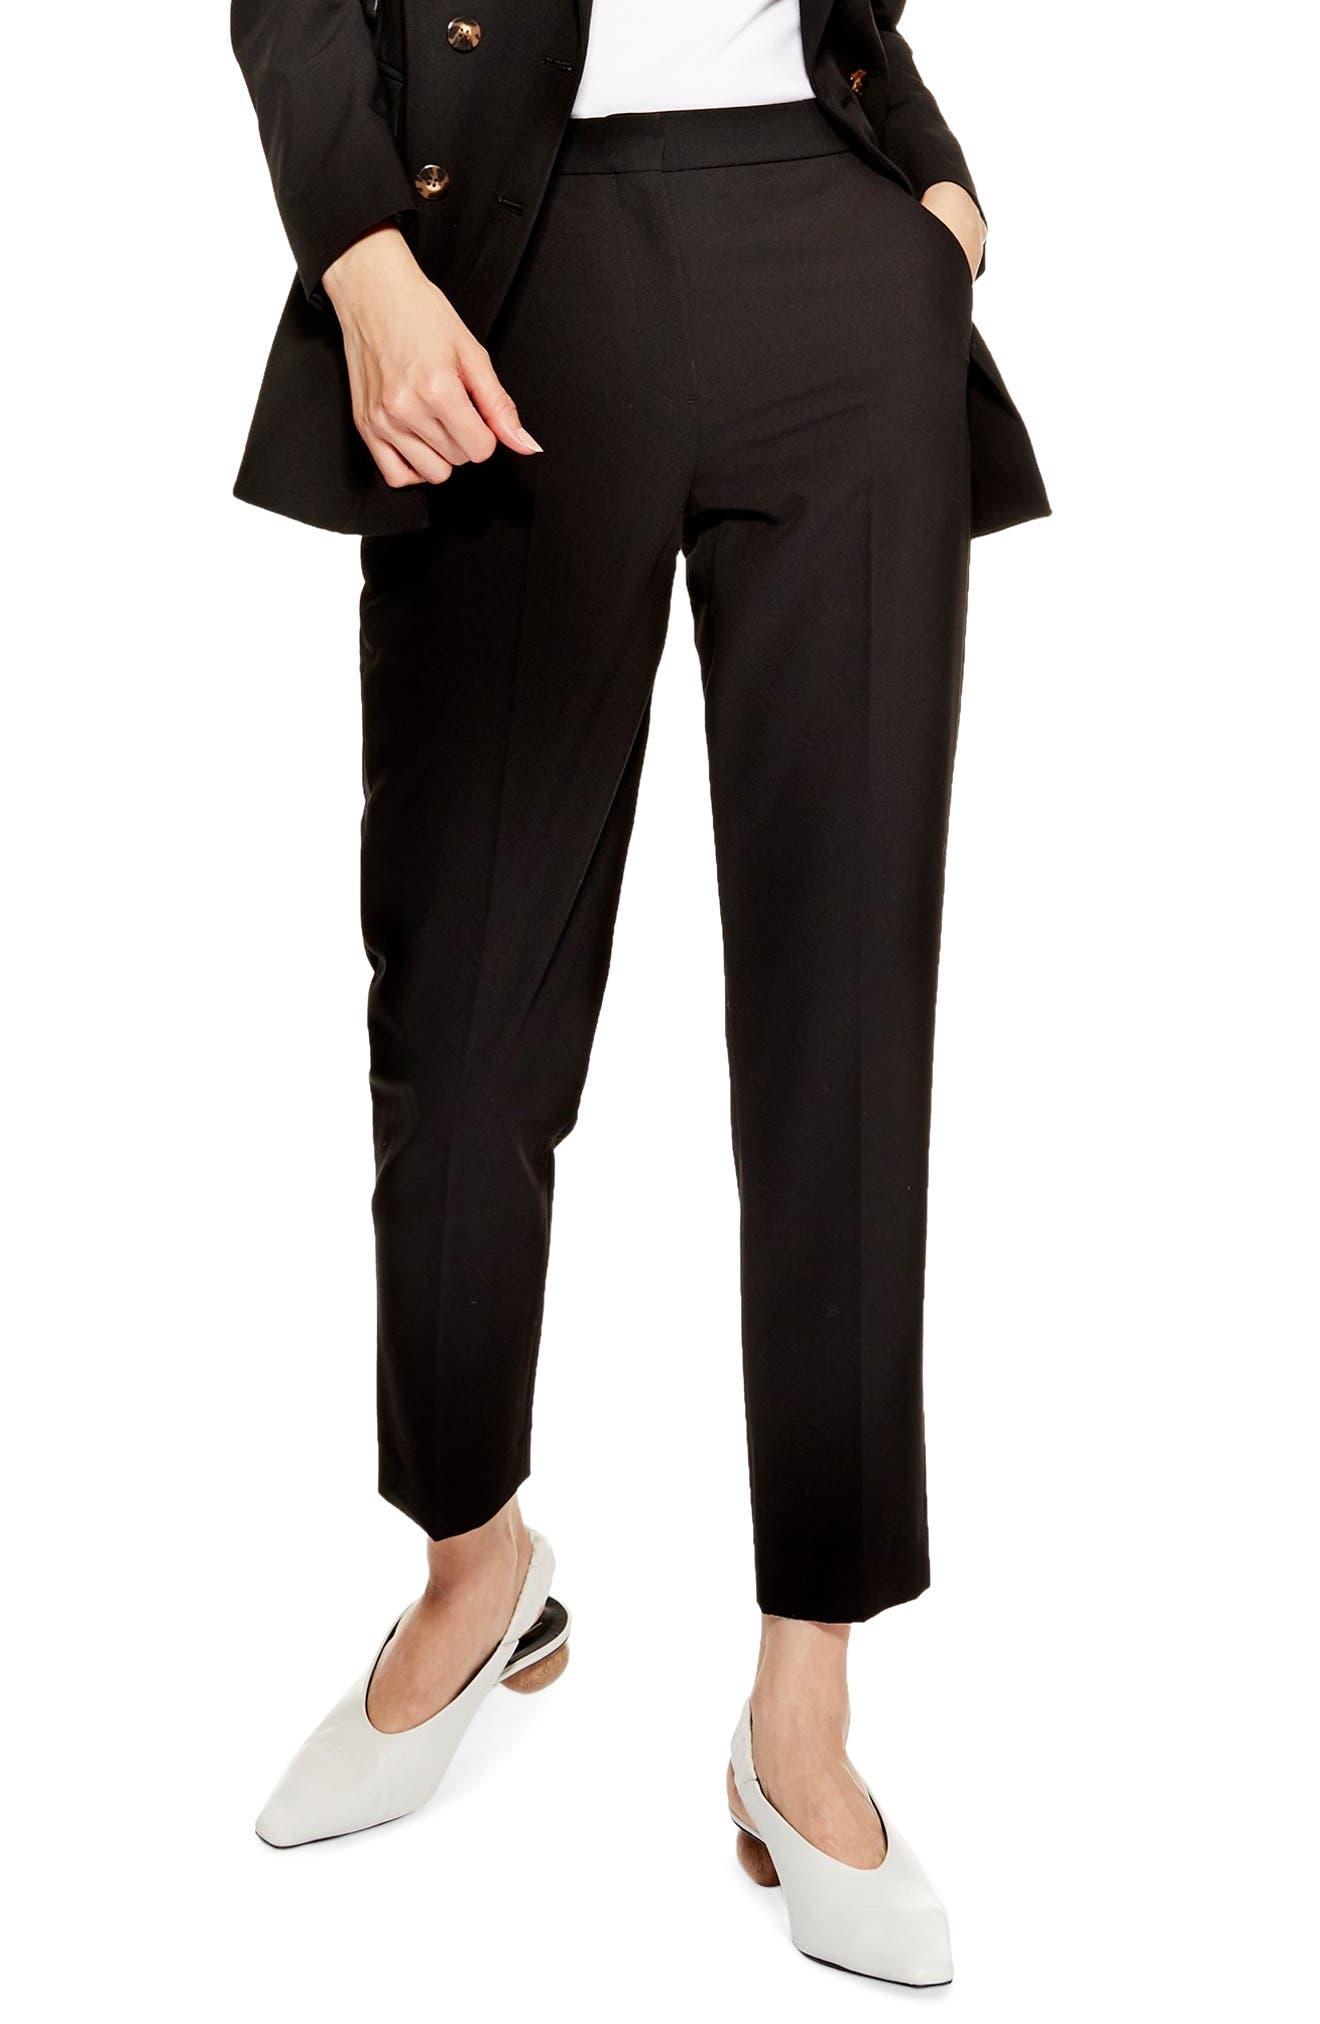 TOPSHOP,                             Kleo Cigarette Trousers,                             Main thumbnail 1, color,                             BLACK